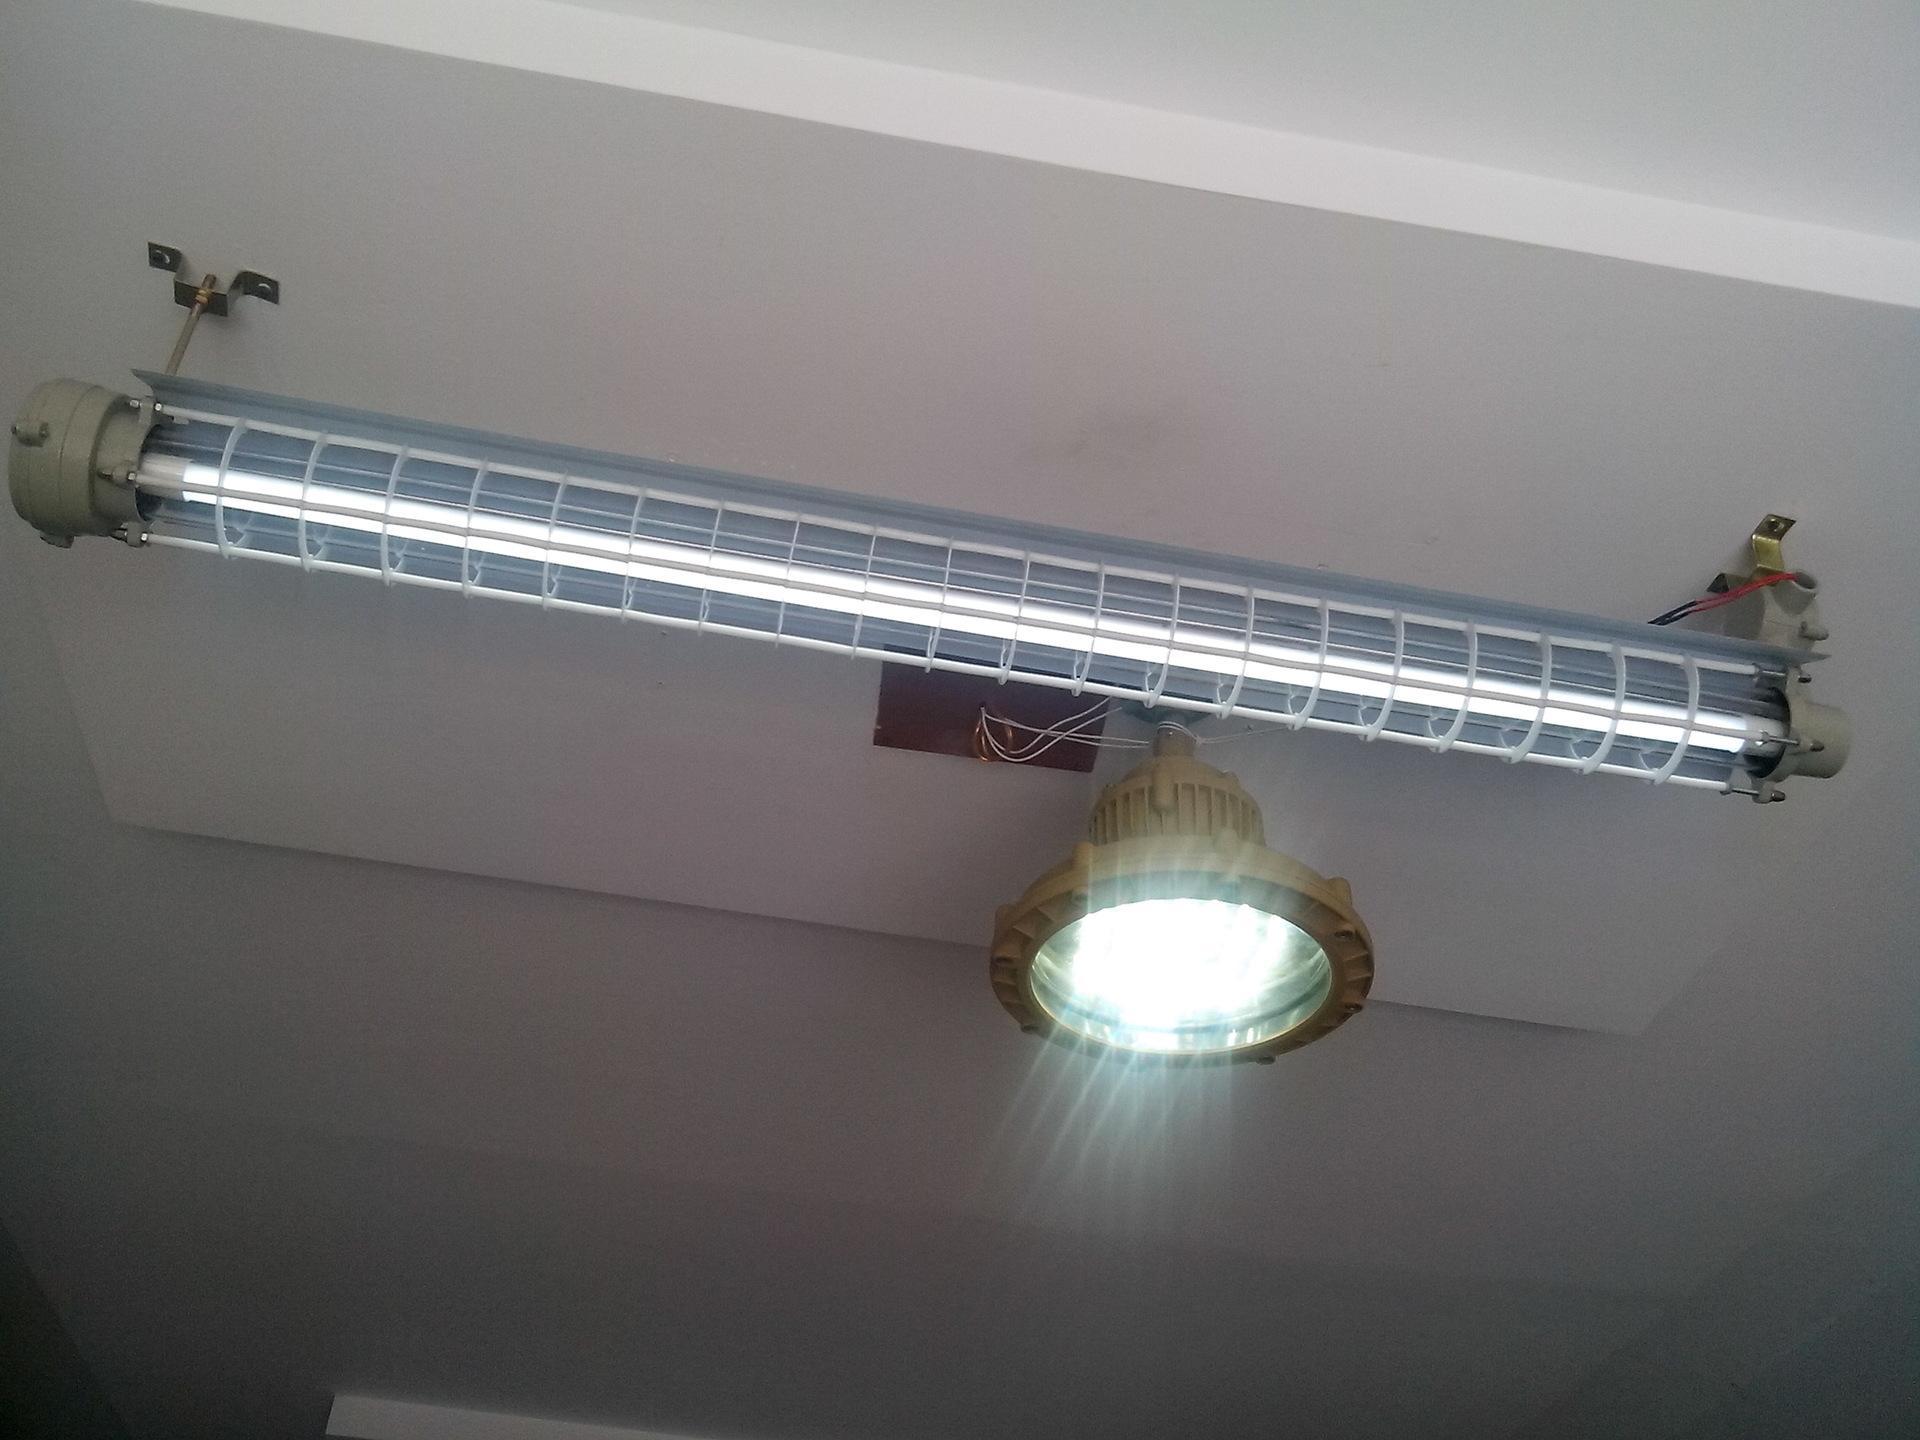 LED 防爆荧光灯、防爆防腐荧光灯、全塑防爆荧光灯